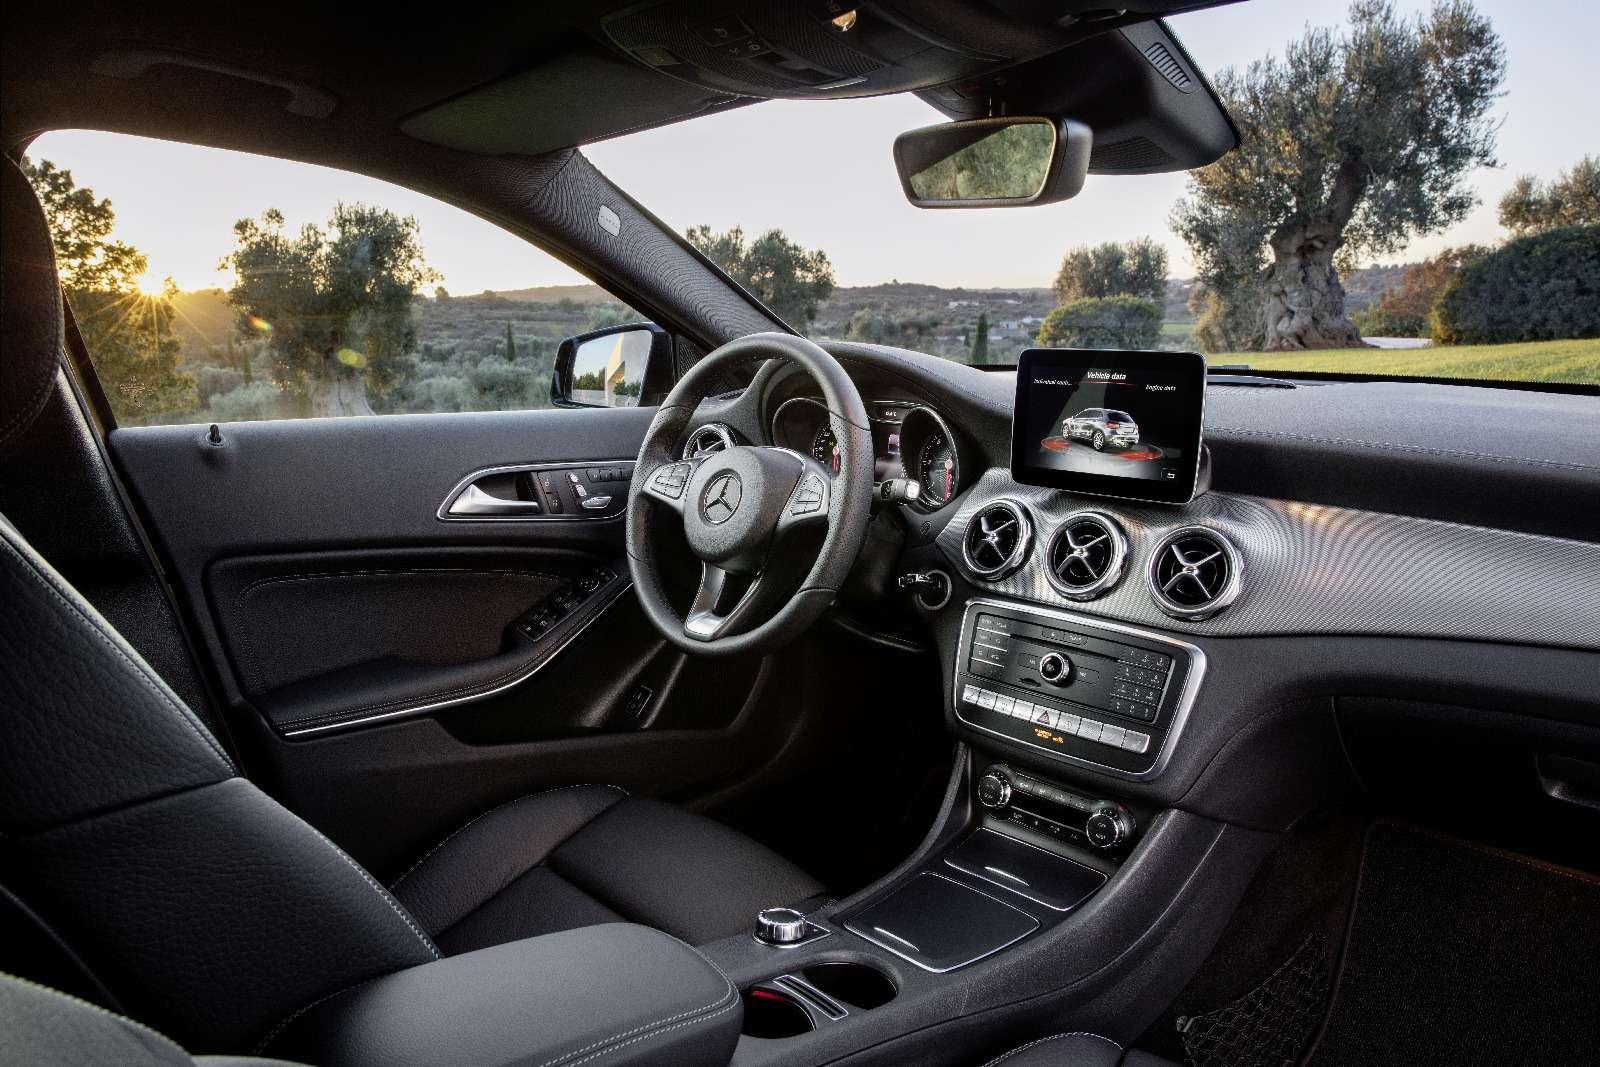 Mercedes-Benz GLA стал краше, ноне просторнее— фото 690064